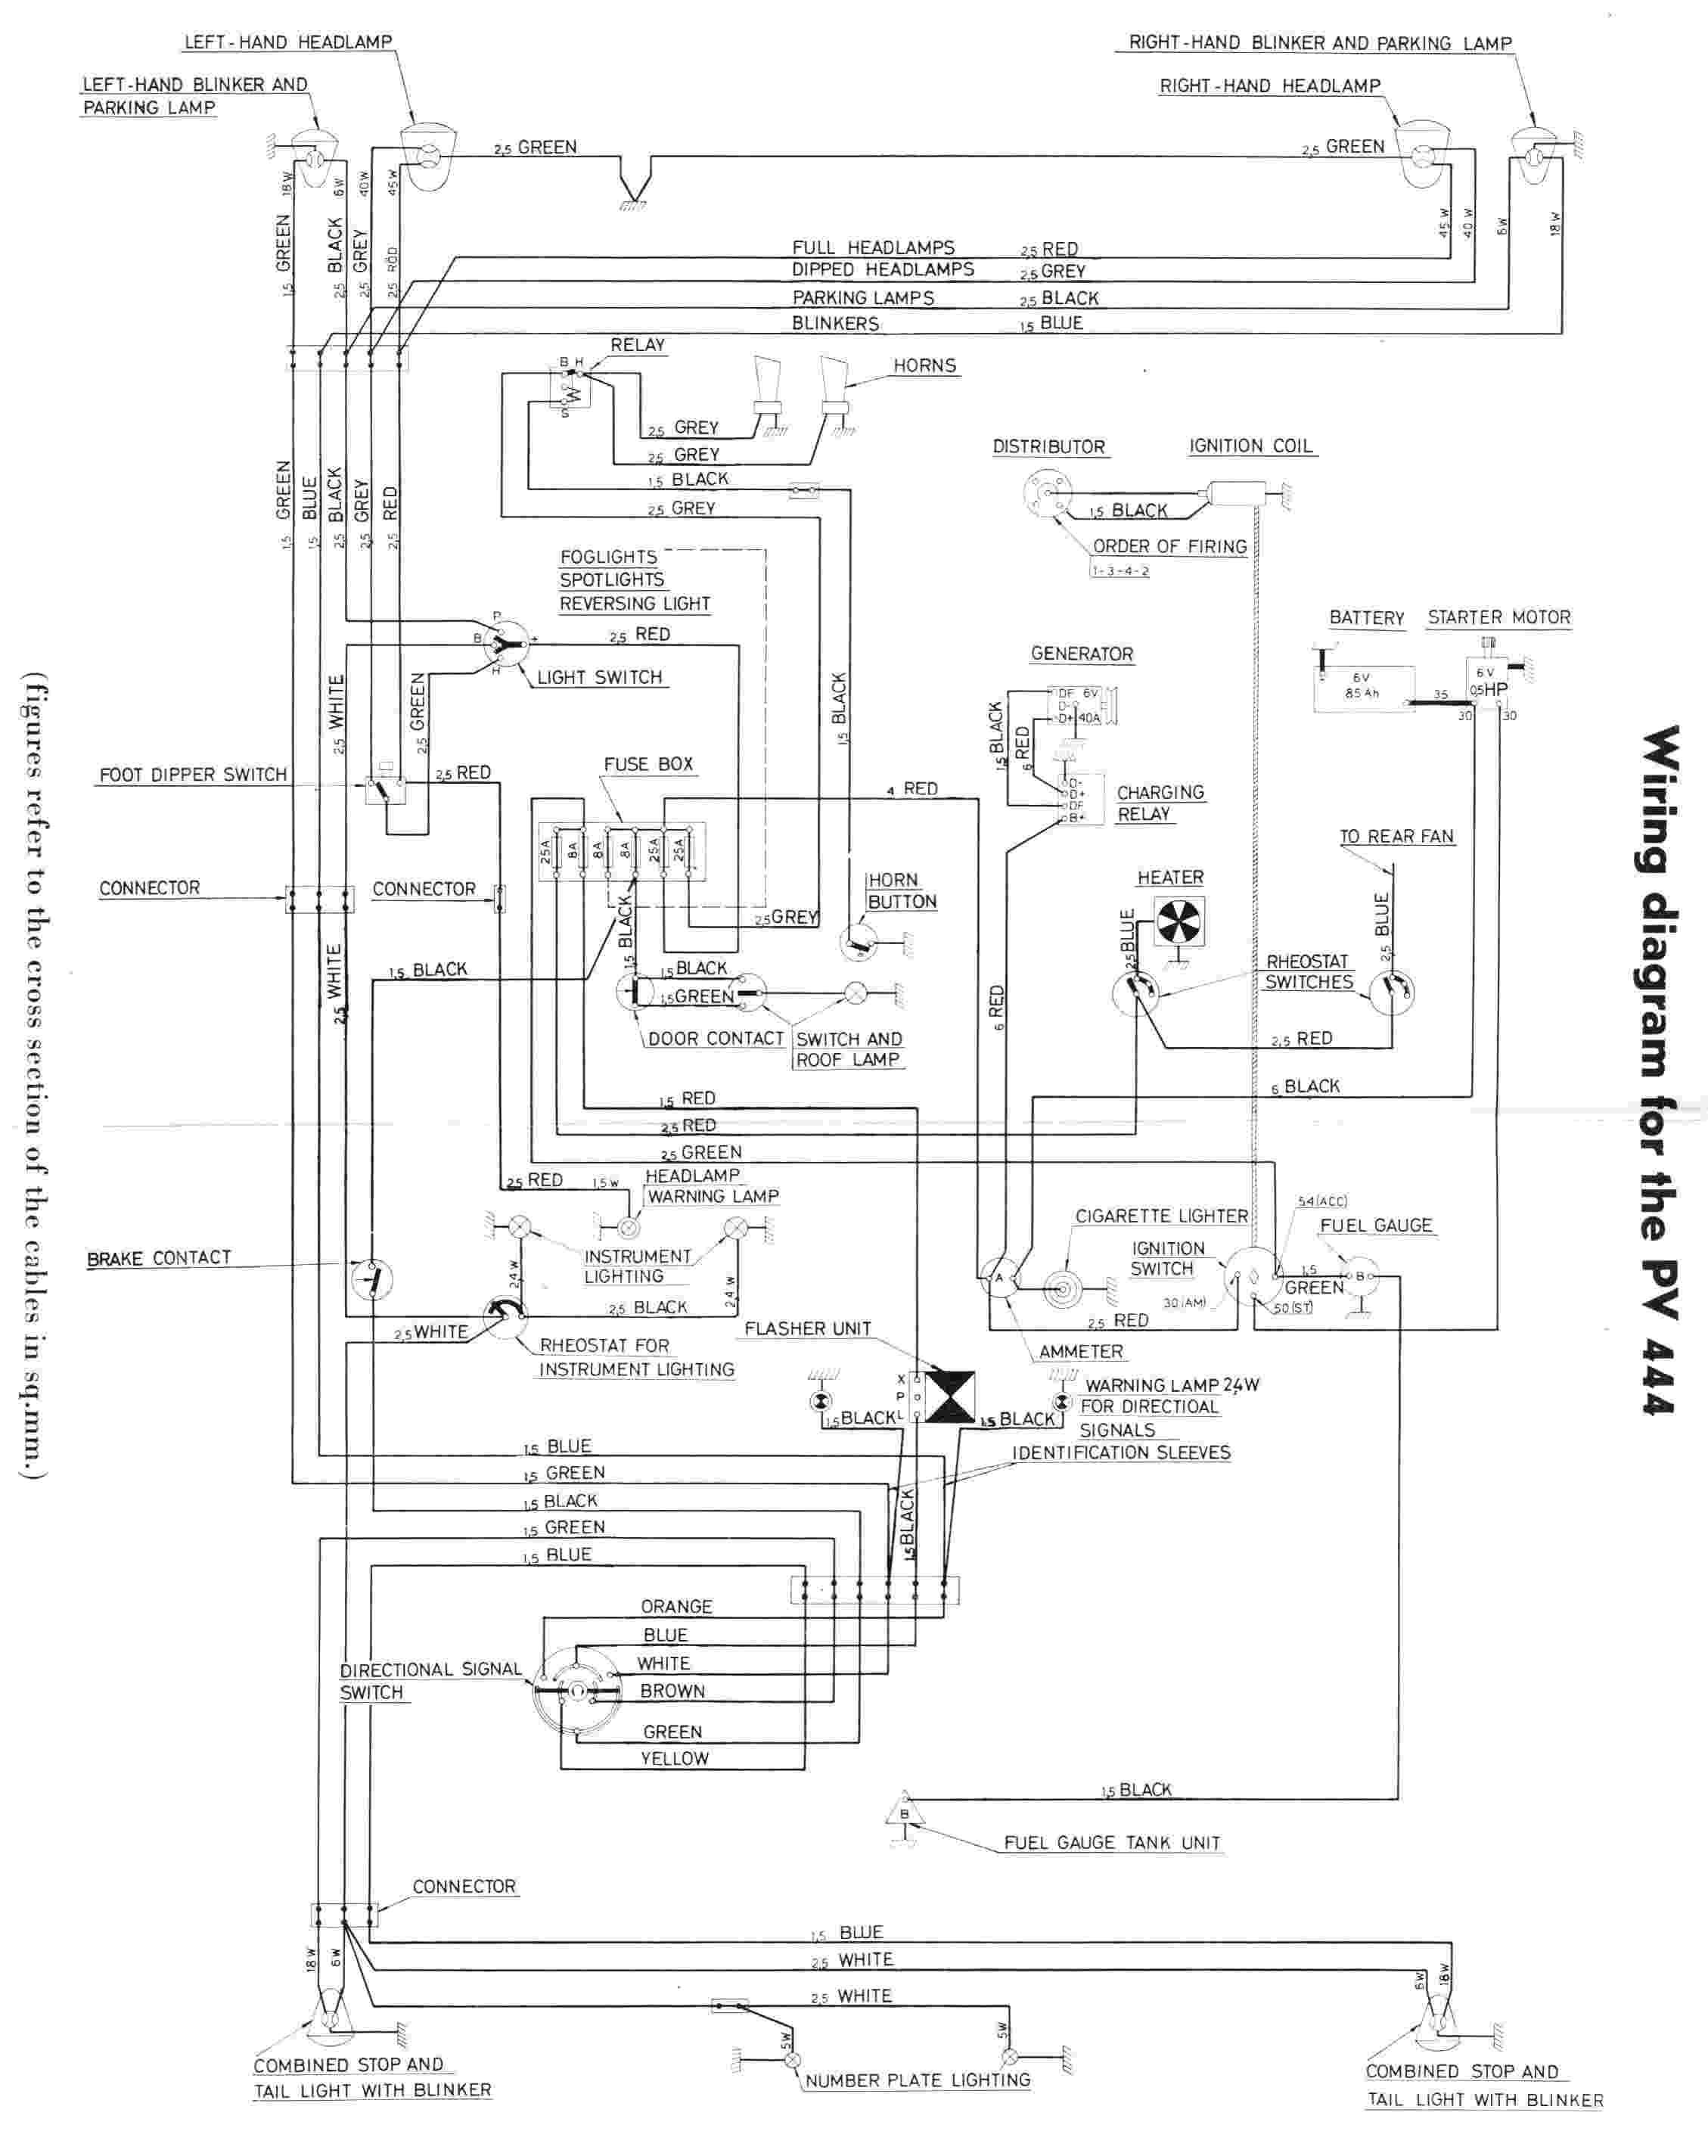 medium resolution of semi truck wiring diagrams wiring diagrams scematic bobcat tractor volvo semi truck dash wiring wiring diagram